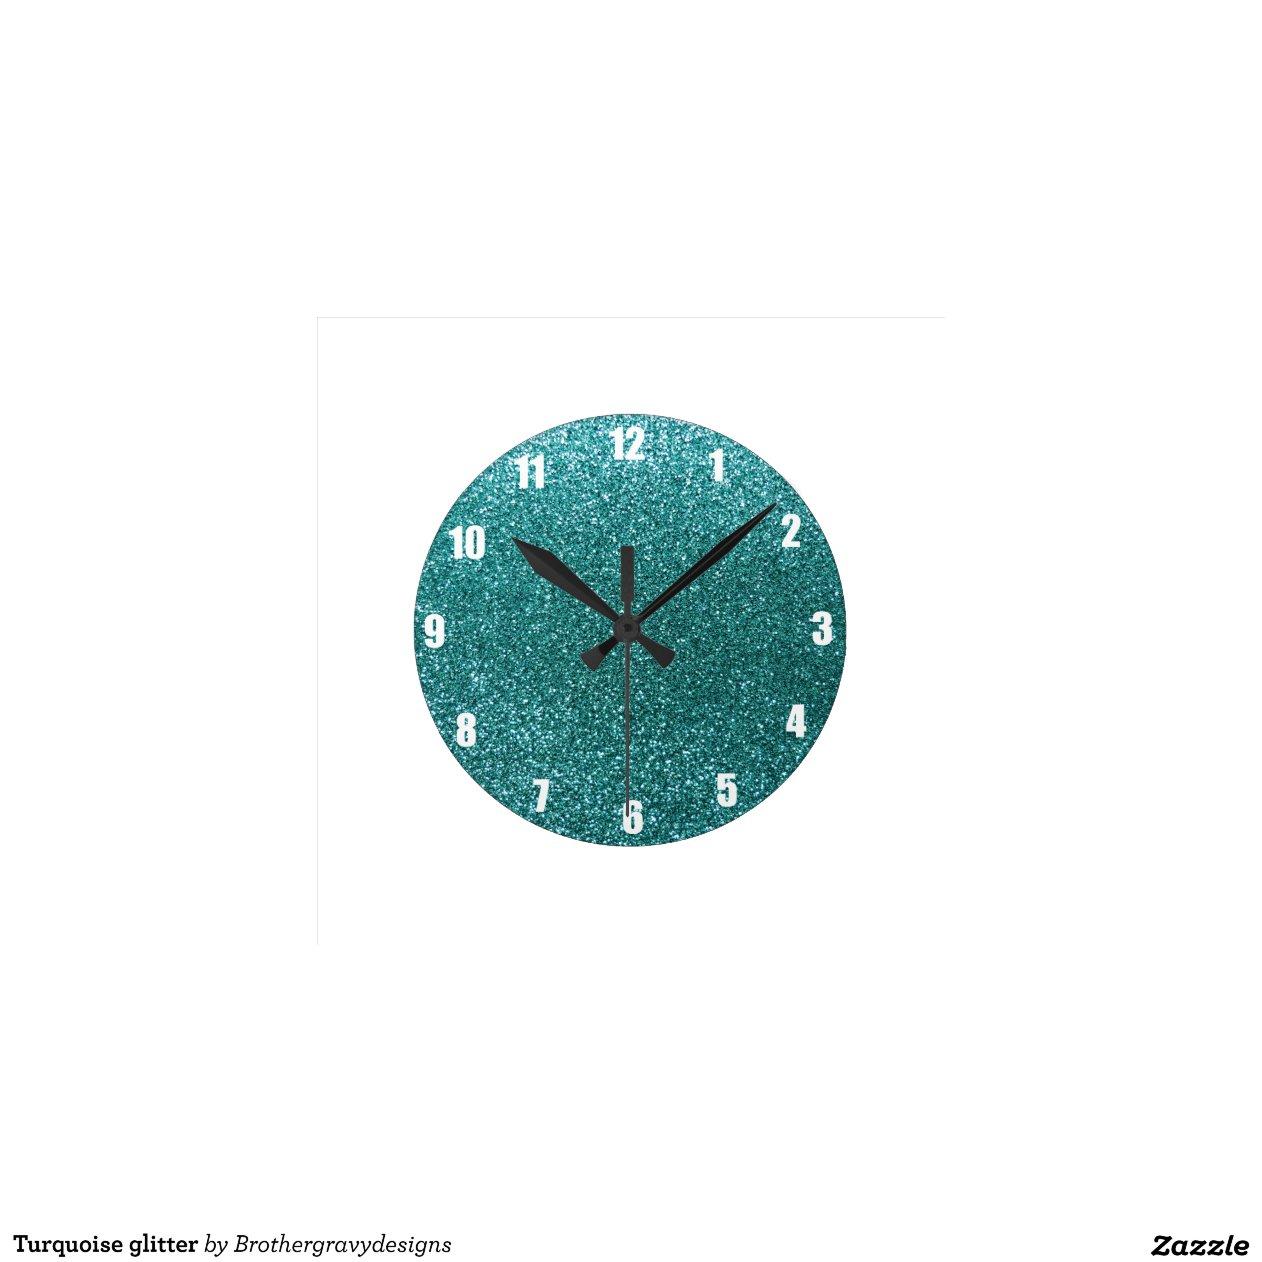 Turquoise Glitter Wall Clocks Zazzle